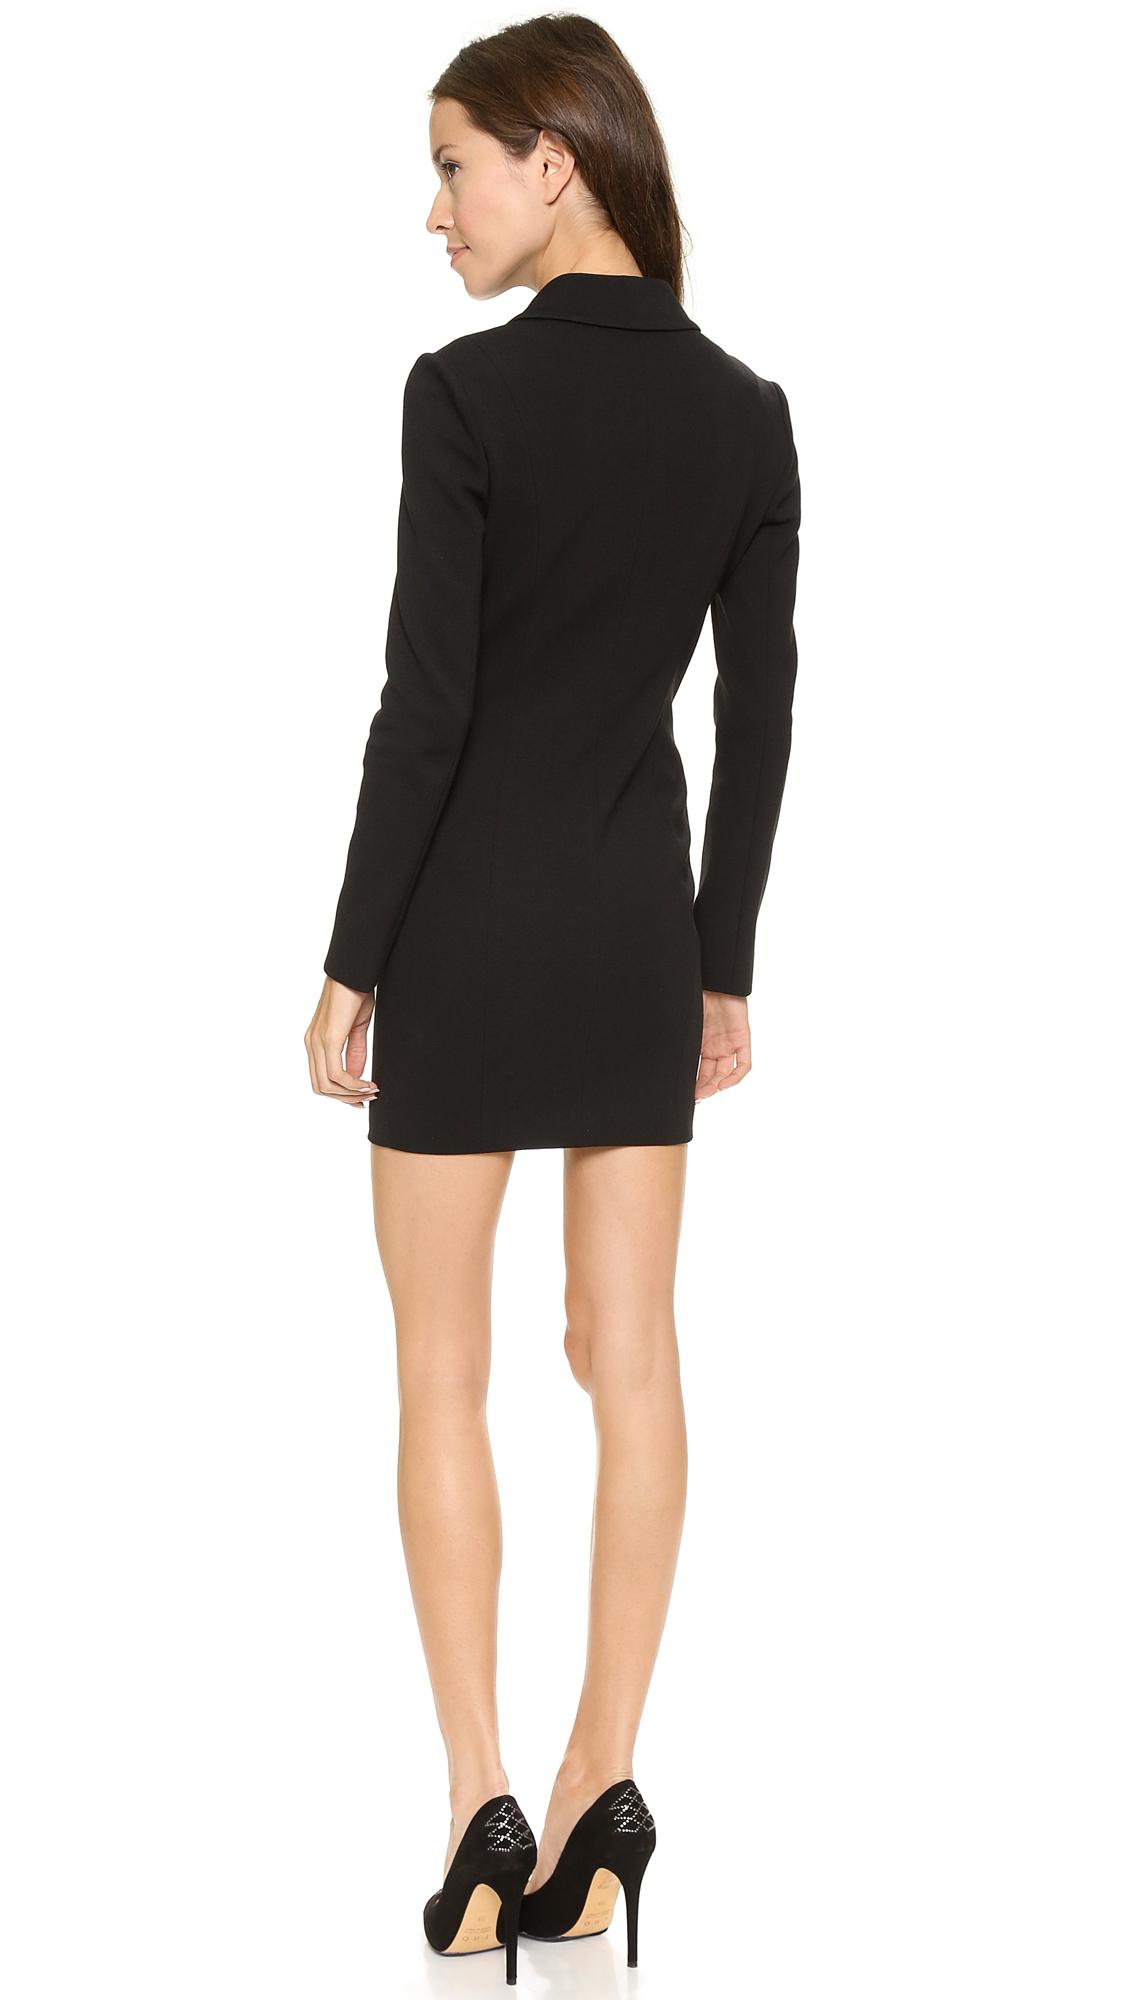 Balmain Zip Up Blazer Dress Black In Black Lyst